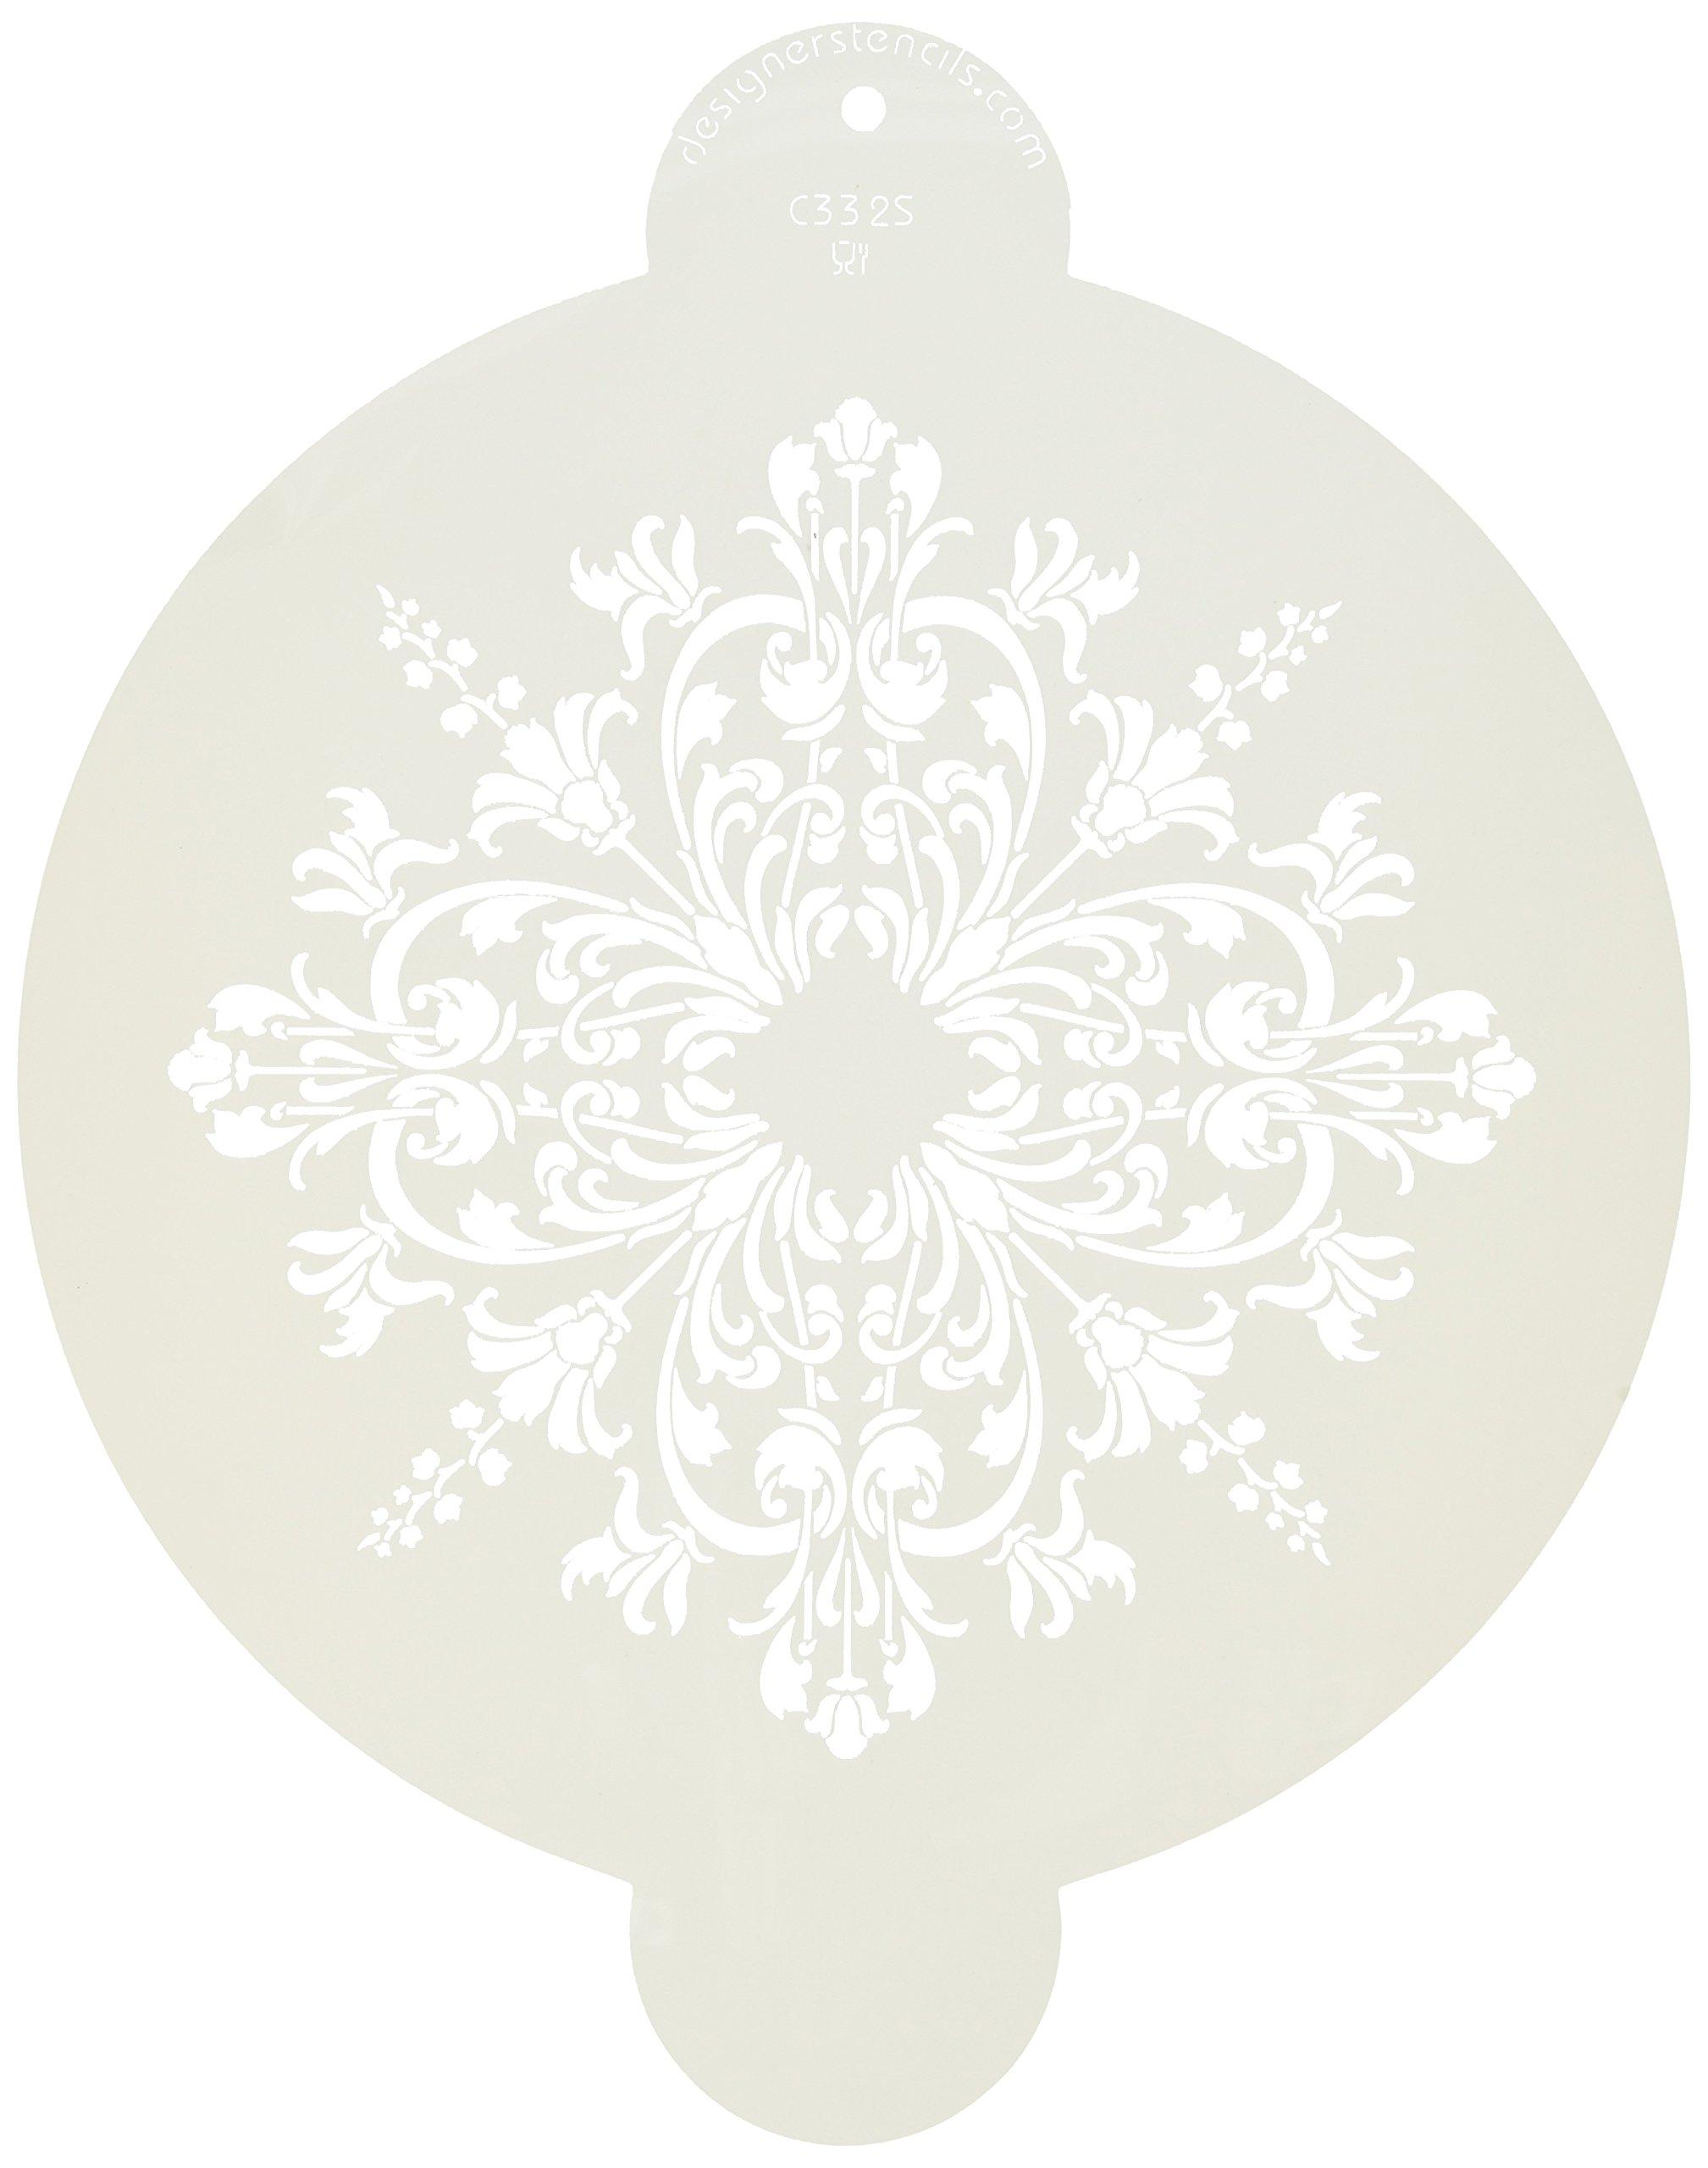 Beige//semi-transparent Designer Stencils C334 Turn of the Century Mini Medallion Stencil